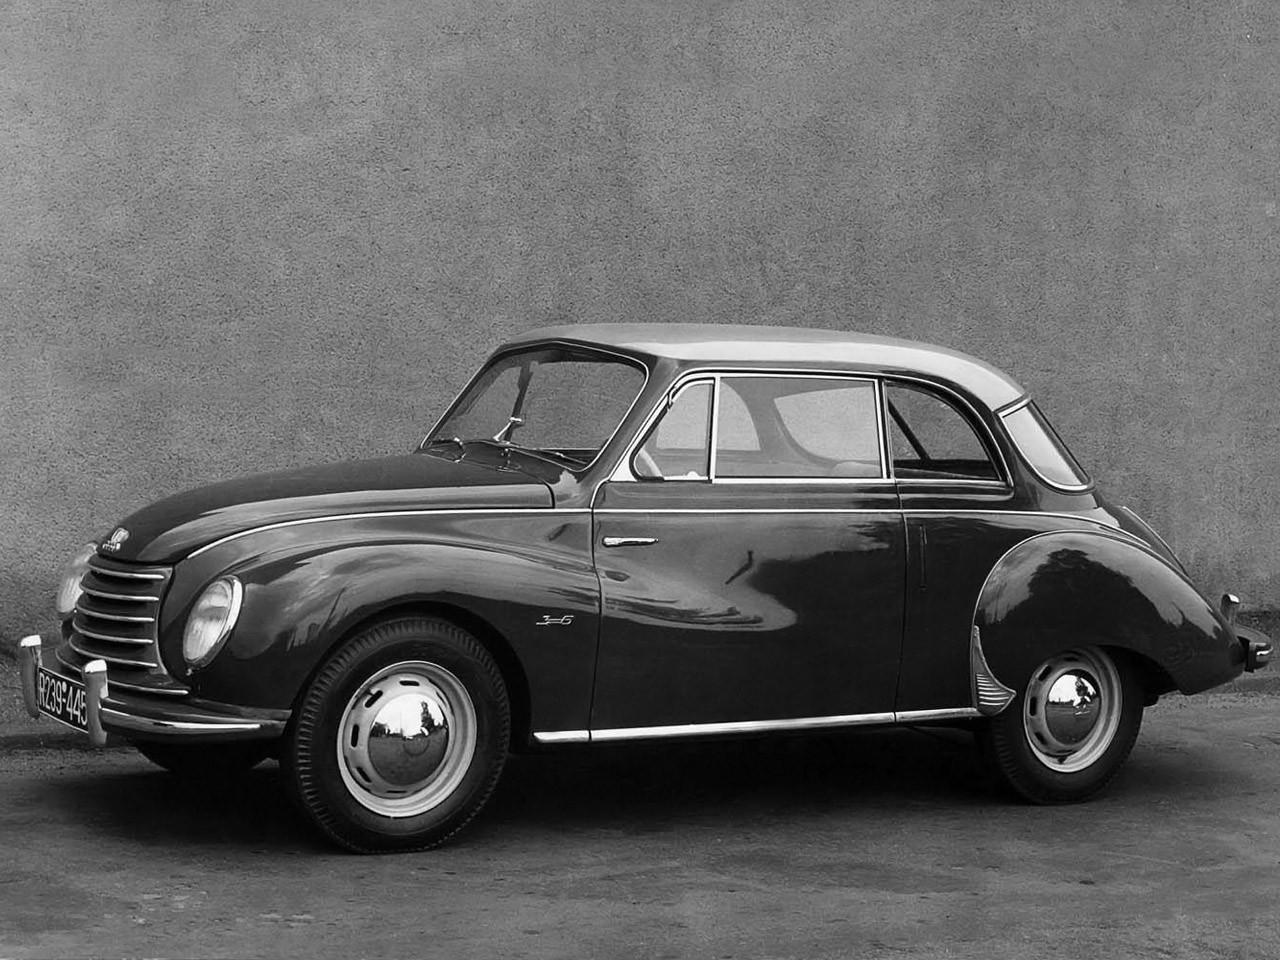 1953 DKW 3=6 Sonderklasse Limousine Spezial F91